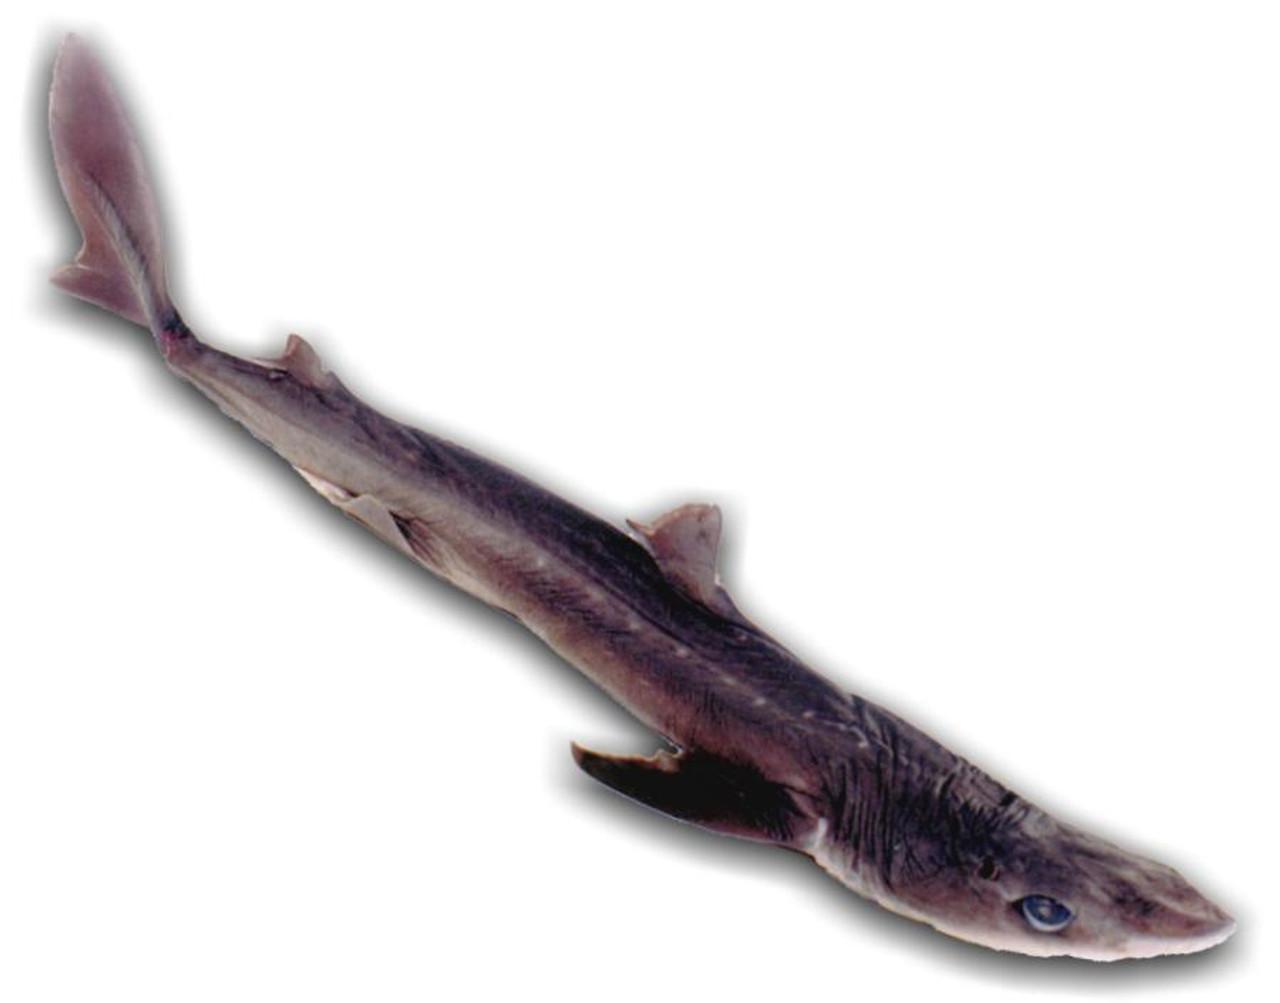 Dogfish Shark Dissection - Anatomy Lab